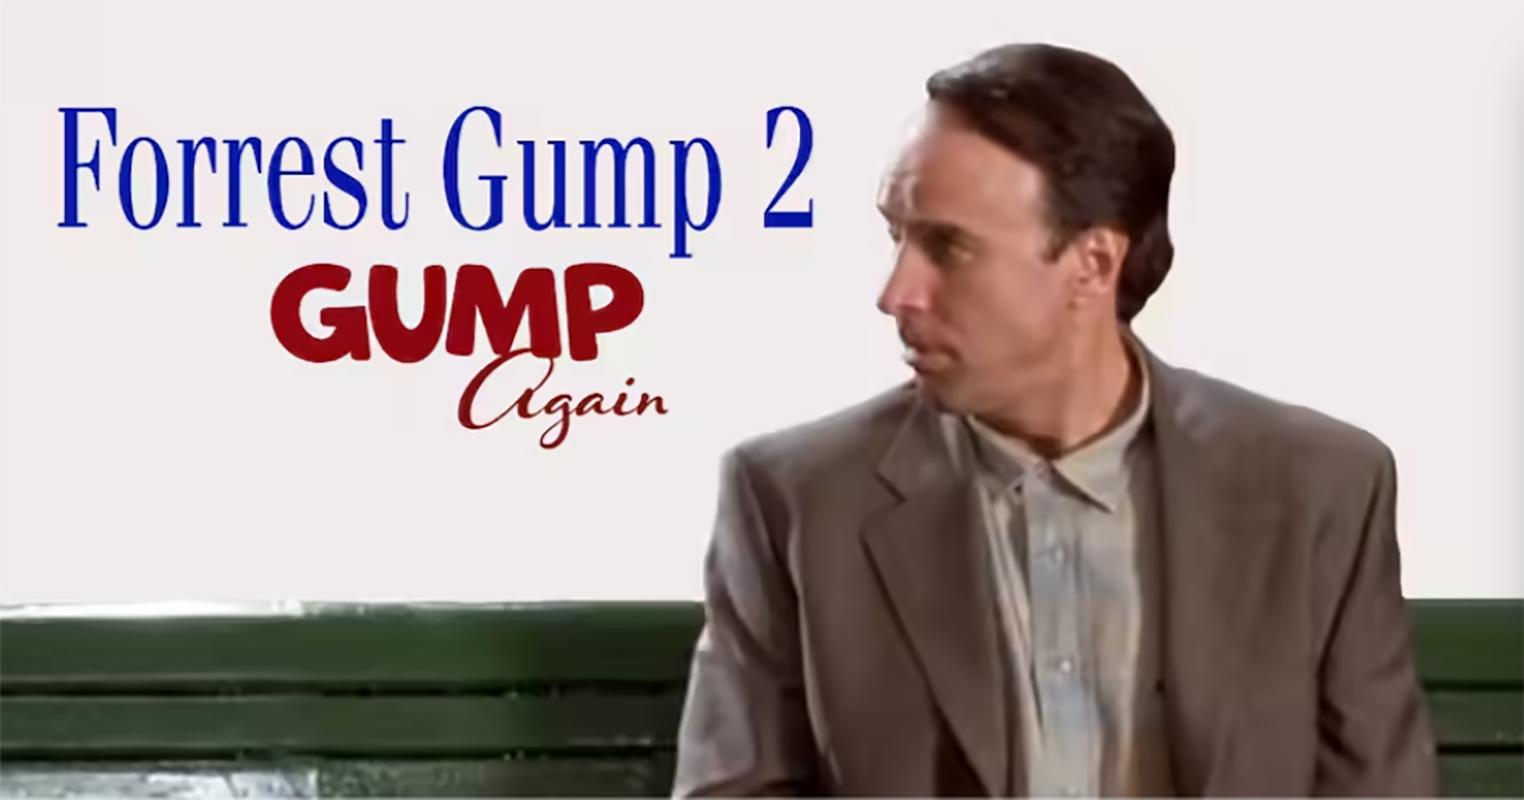 Forrest Gump 2: Gump Again